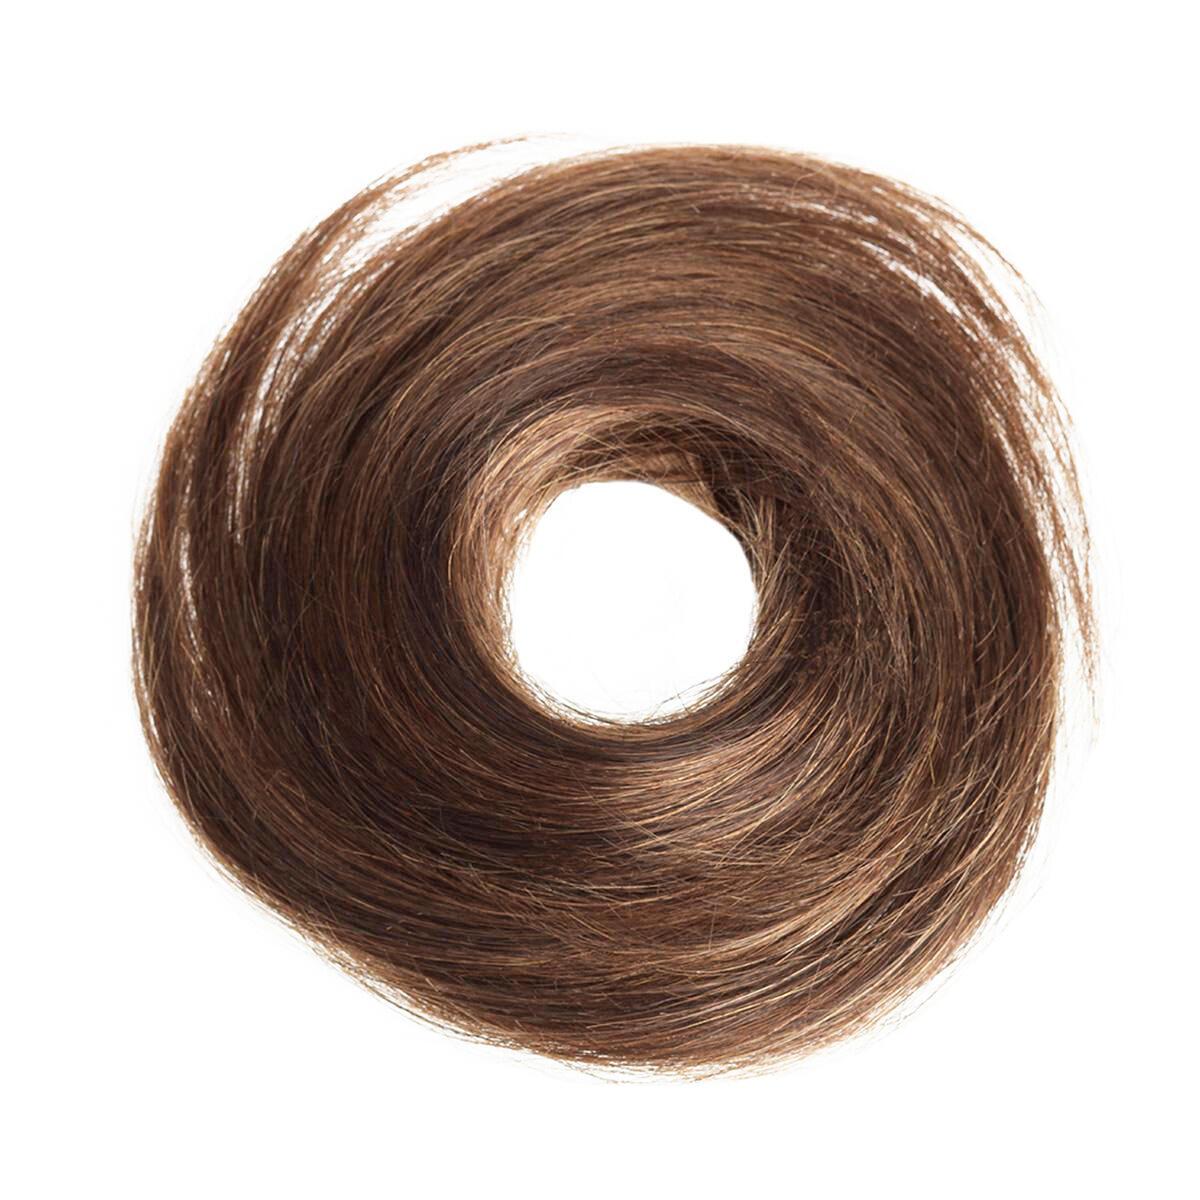 Hair Scrunchie M2.3/5.0 Chocolate Mix 0 cm